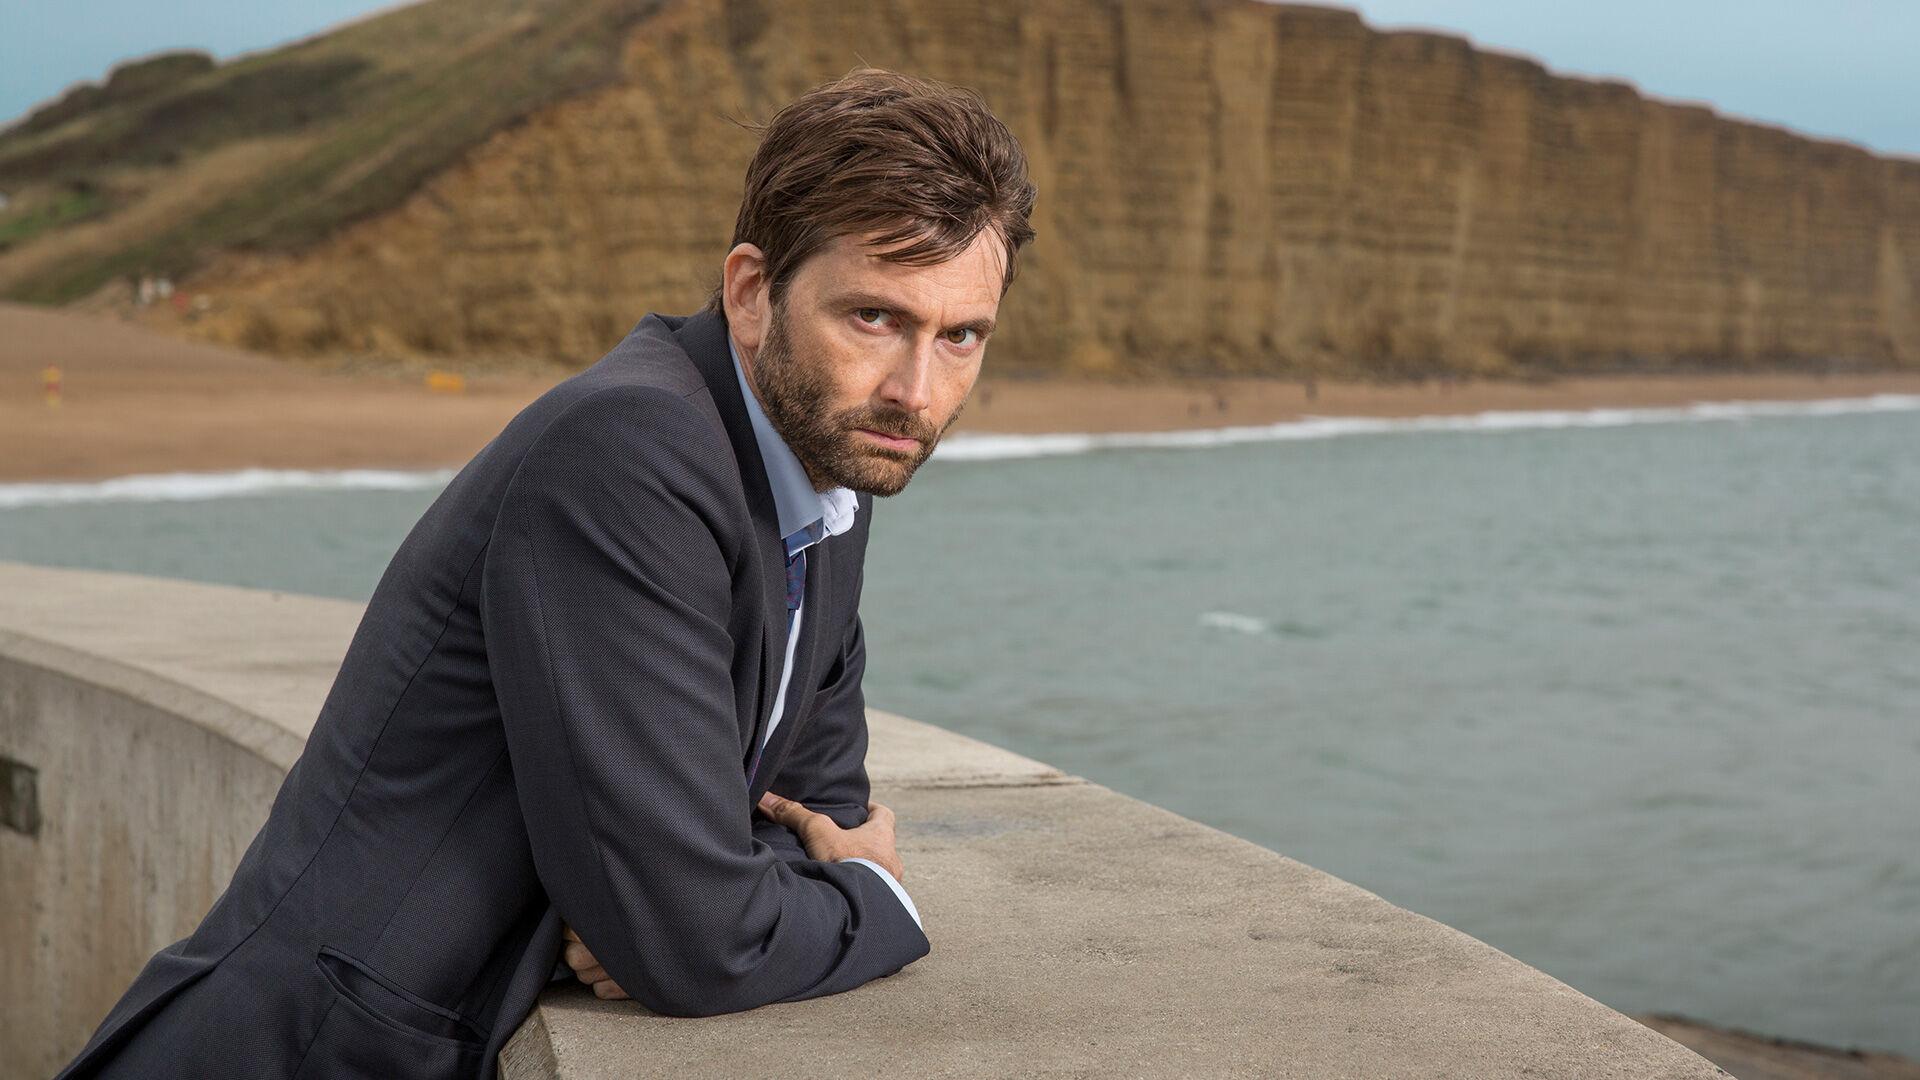 david tennant harry potter barty kupor doctor who